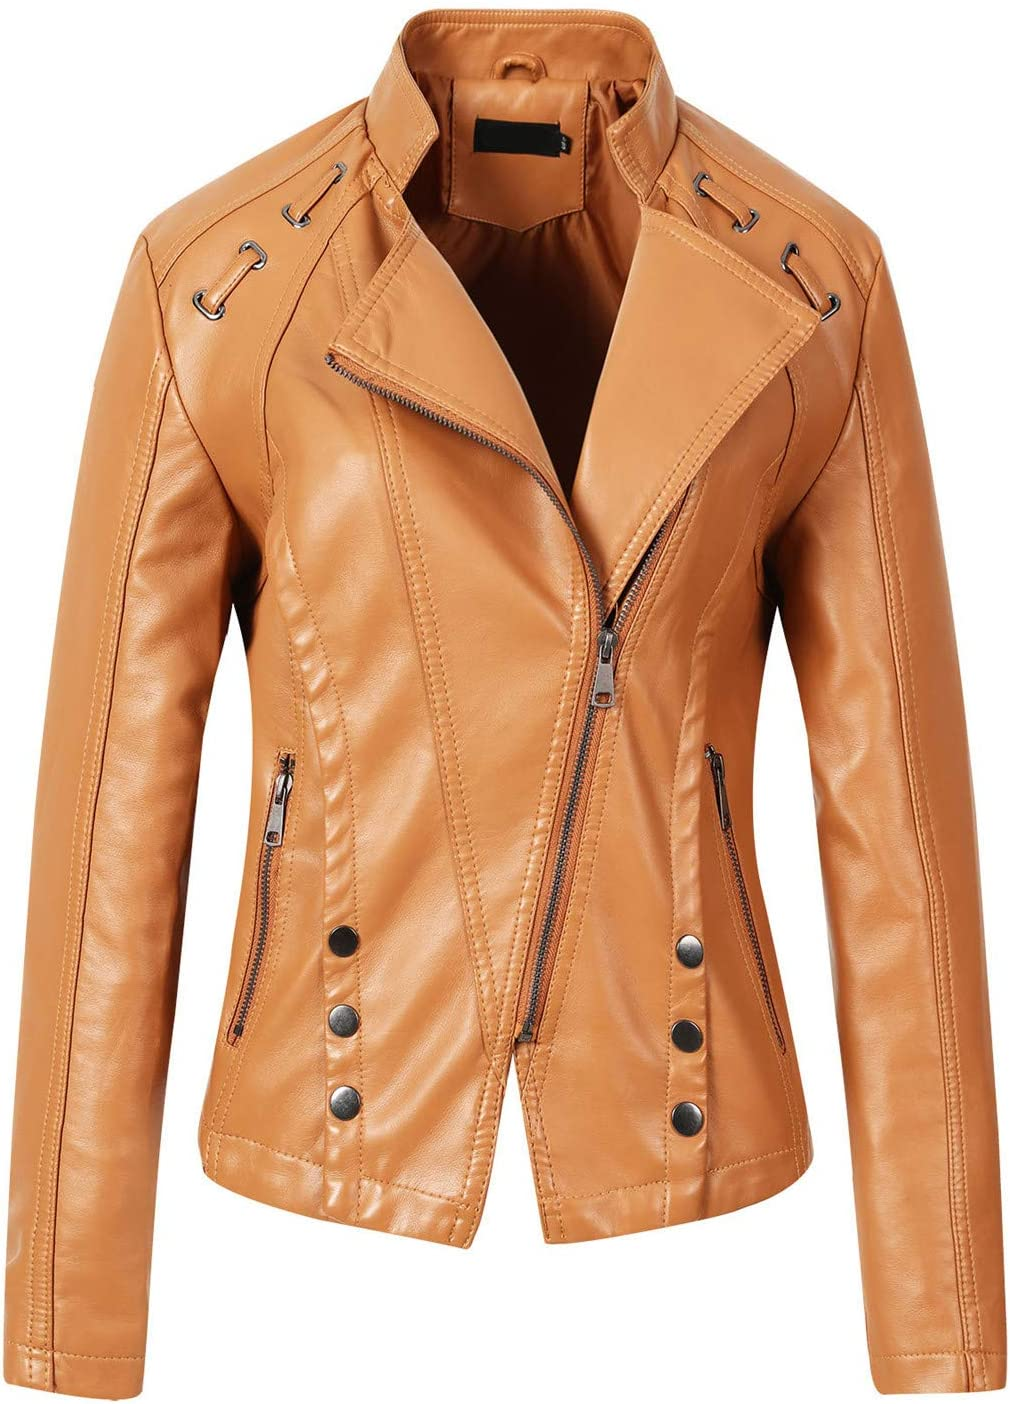 EverNight Women Faux Leather Casual Short Jacket,Slim Tailoring PU Short Biker Jacket,Studded Spring Fall Outwear,1,XL